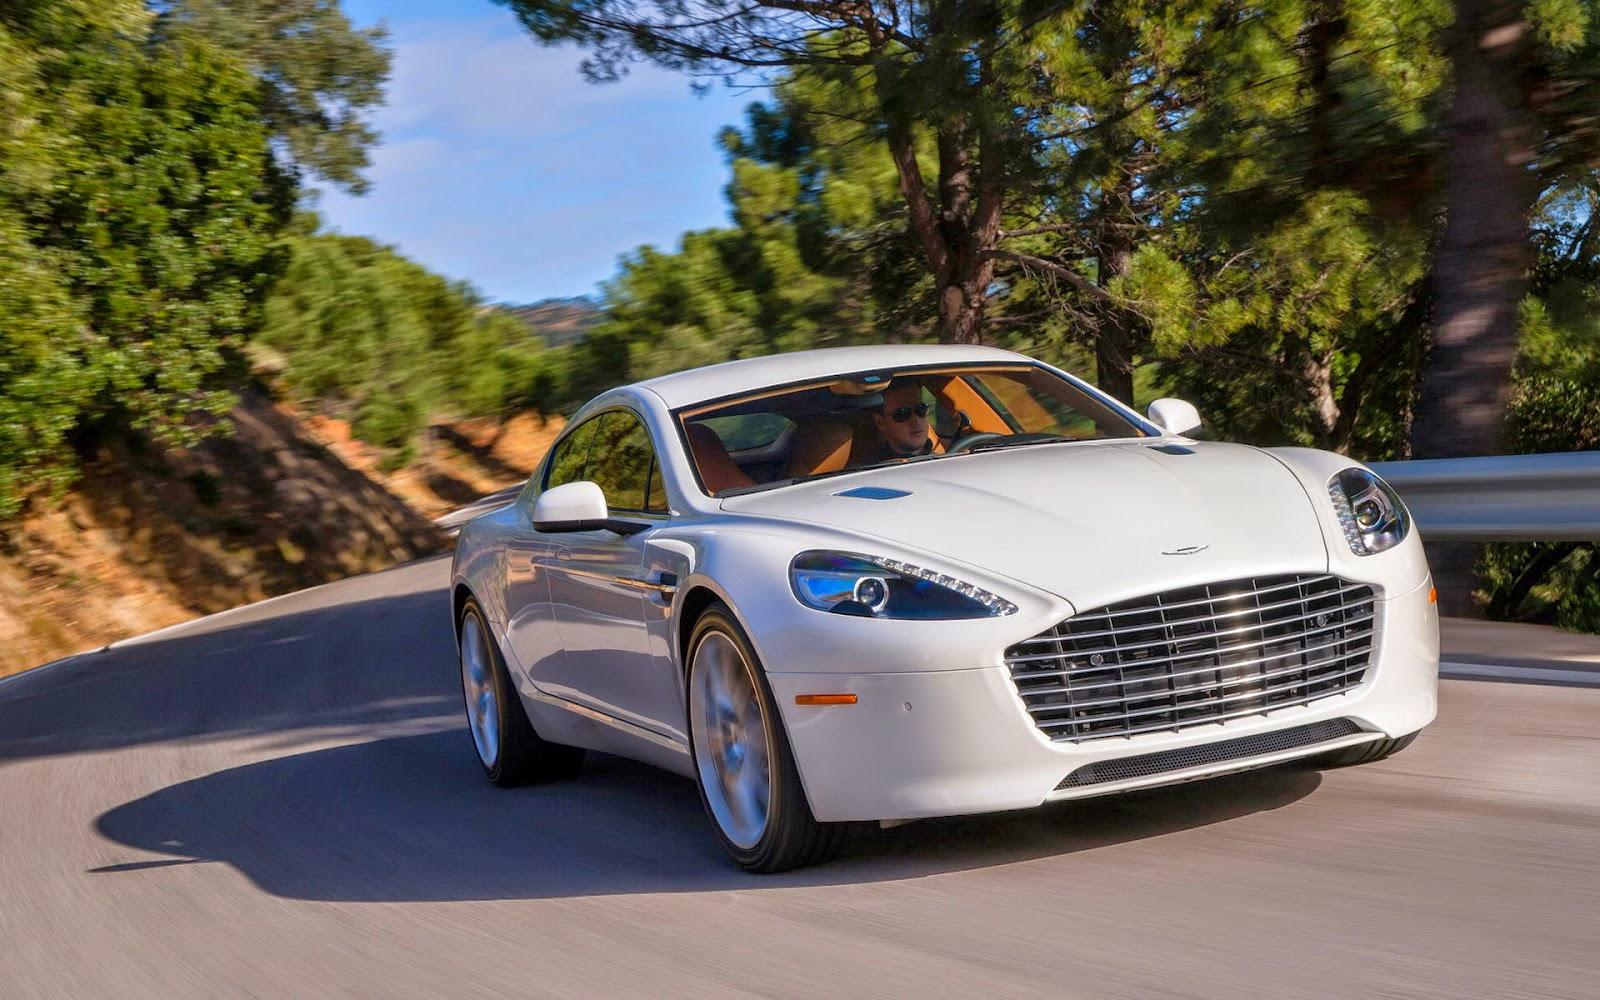 2014 sports cars under 30k